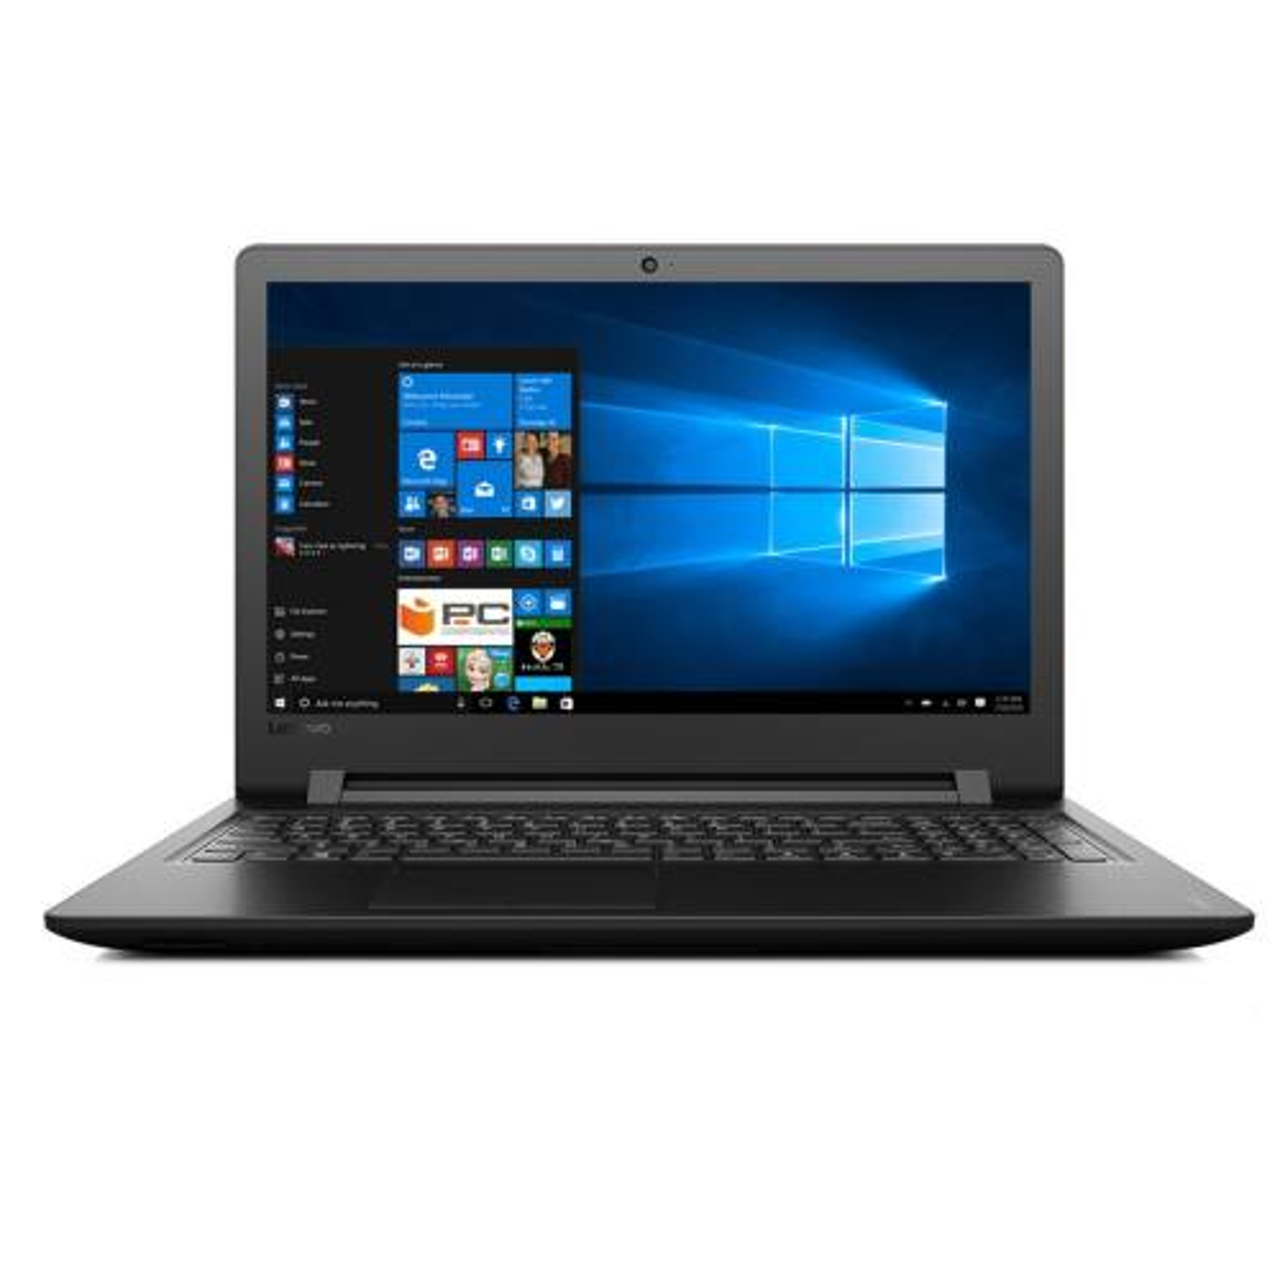 لپ تاپ 15 اینچی لنوو مدل Ideapad 110 - 15ISK